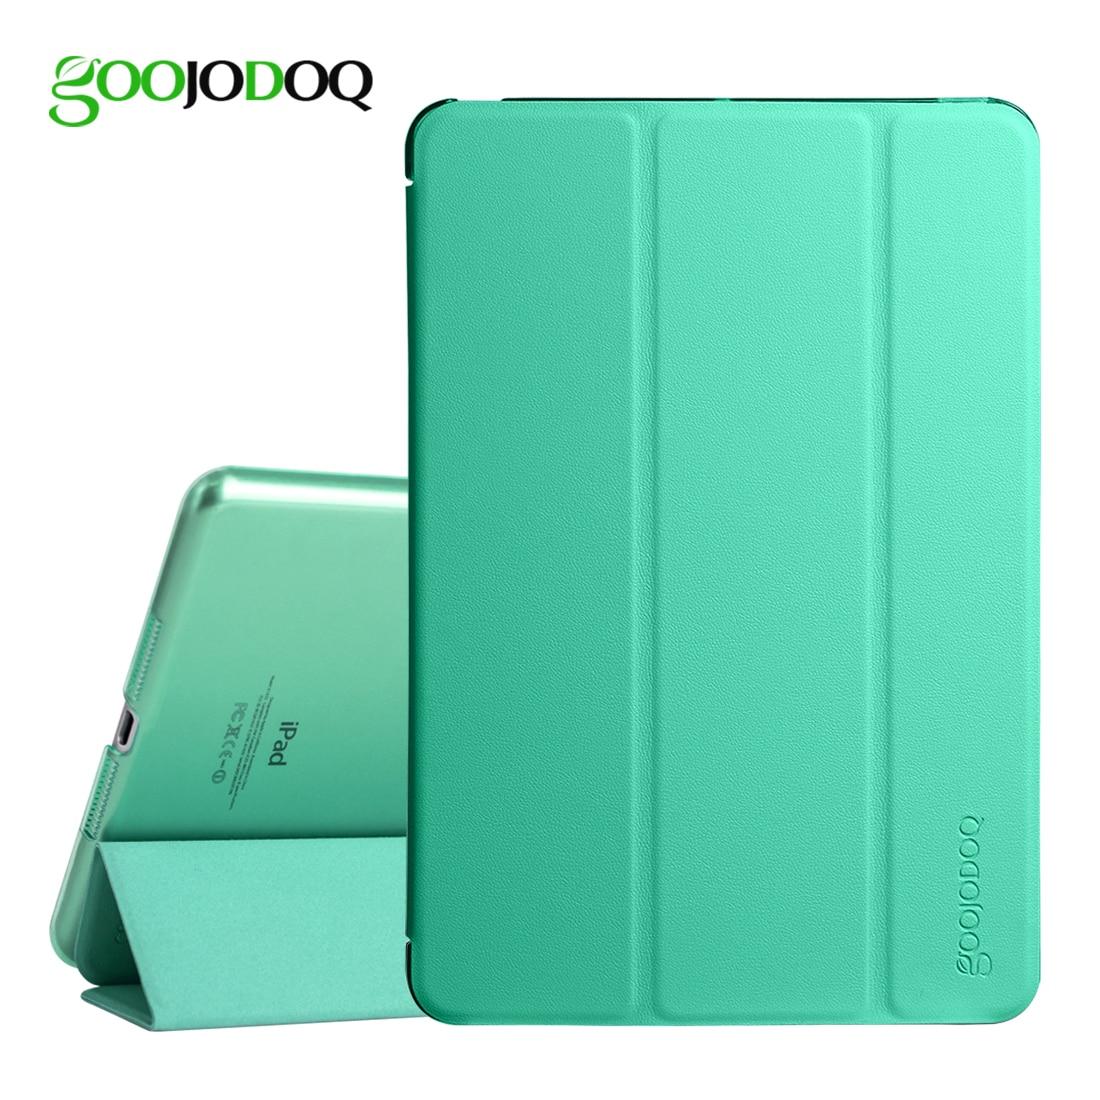 For iPad Pro 9.7 Case, GOOJODOQ PU Leather Smart Cover with Translucent PC Back Case for Apple iPad Pro 9.7 inch Auto Wake/Wake